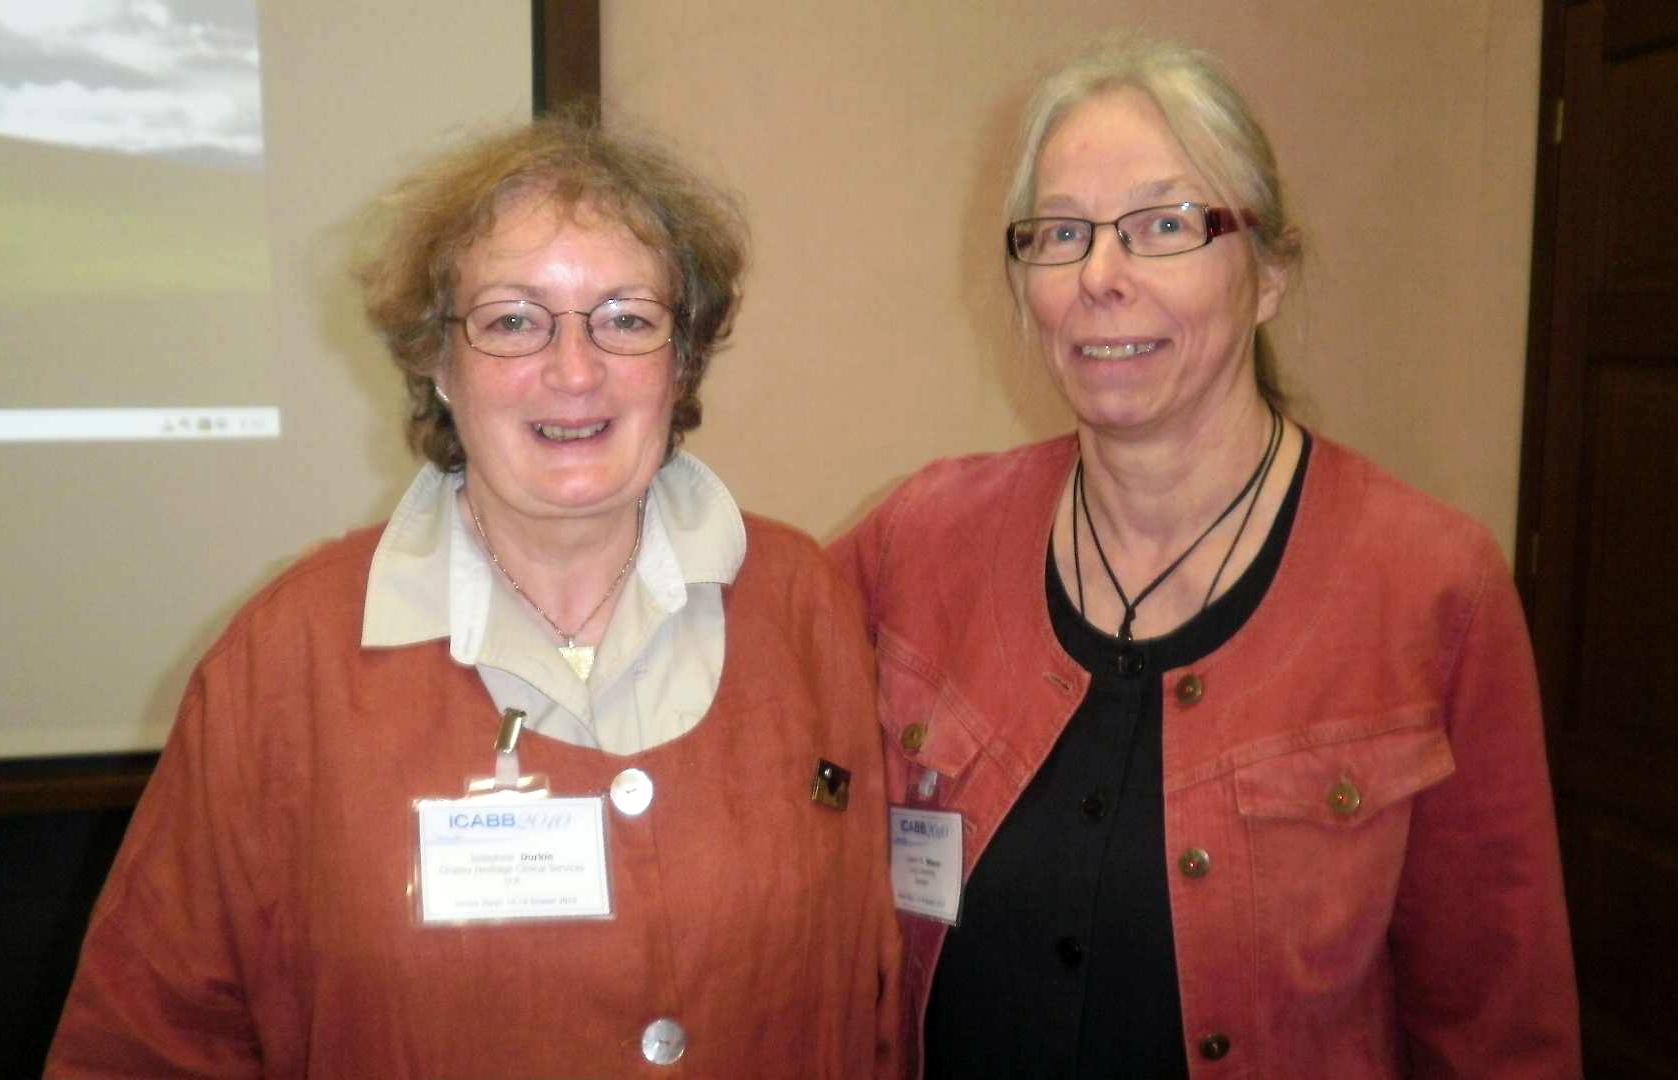 Josephine Durkin och Lisbeth Nilsson